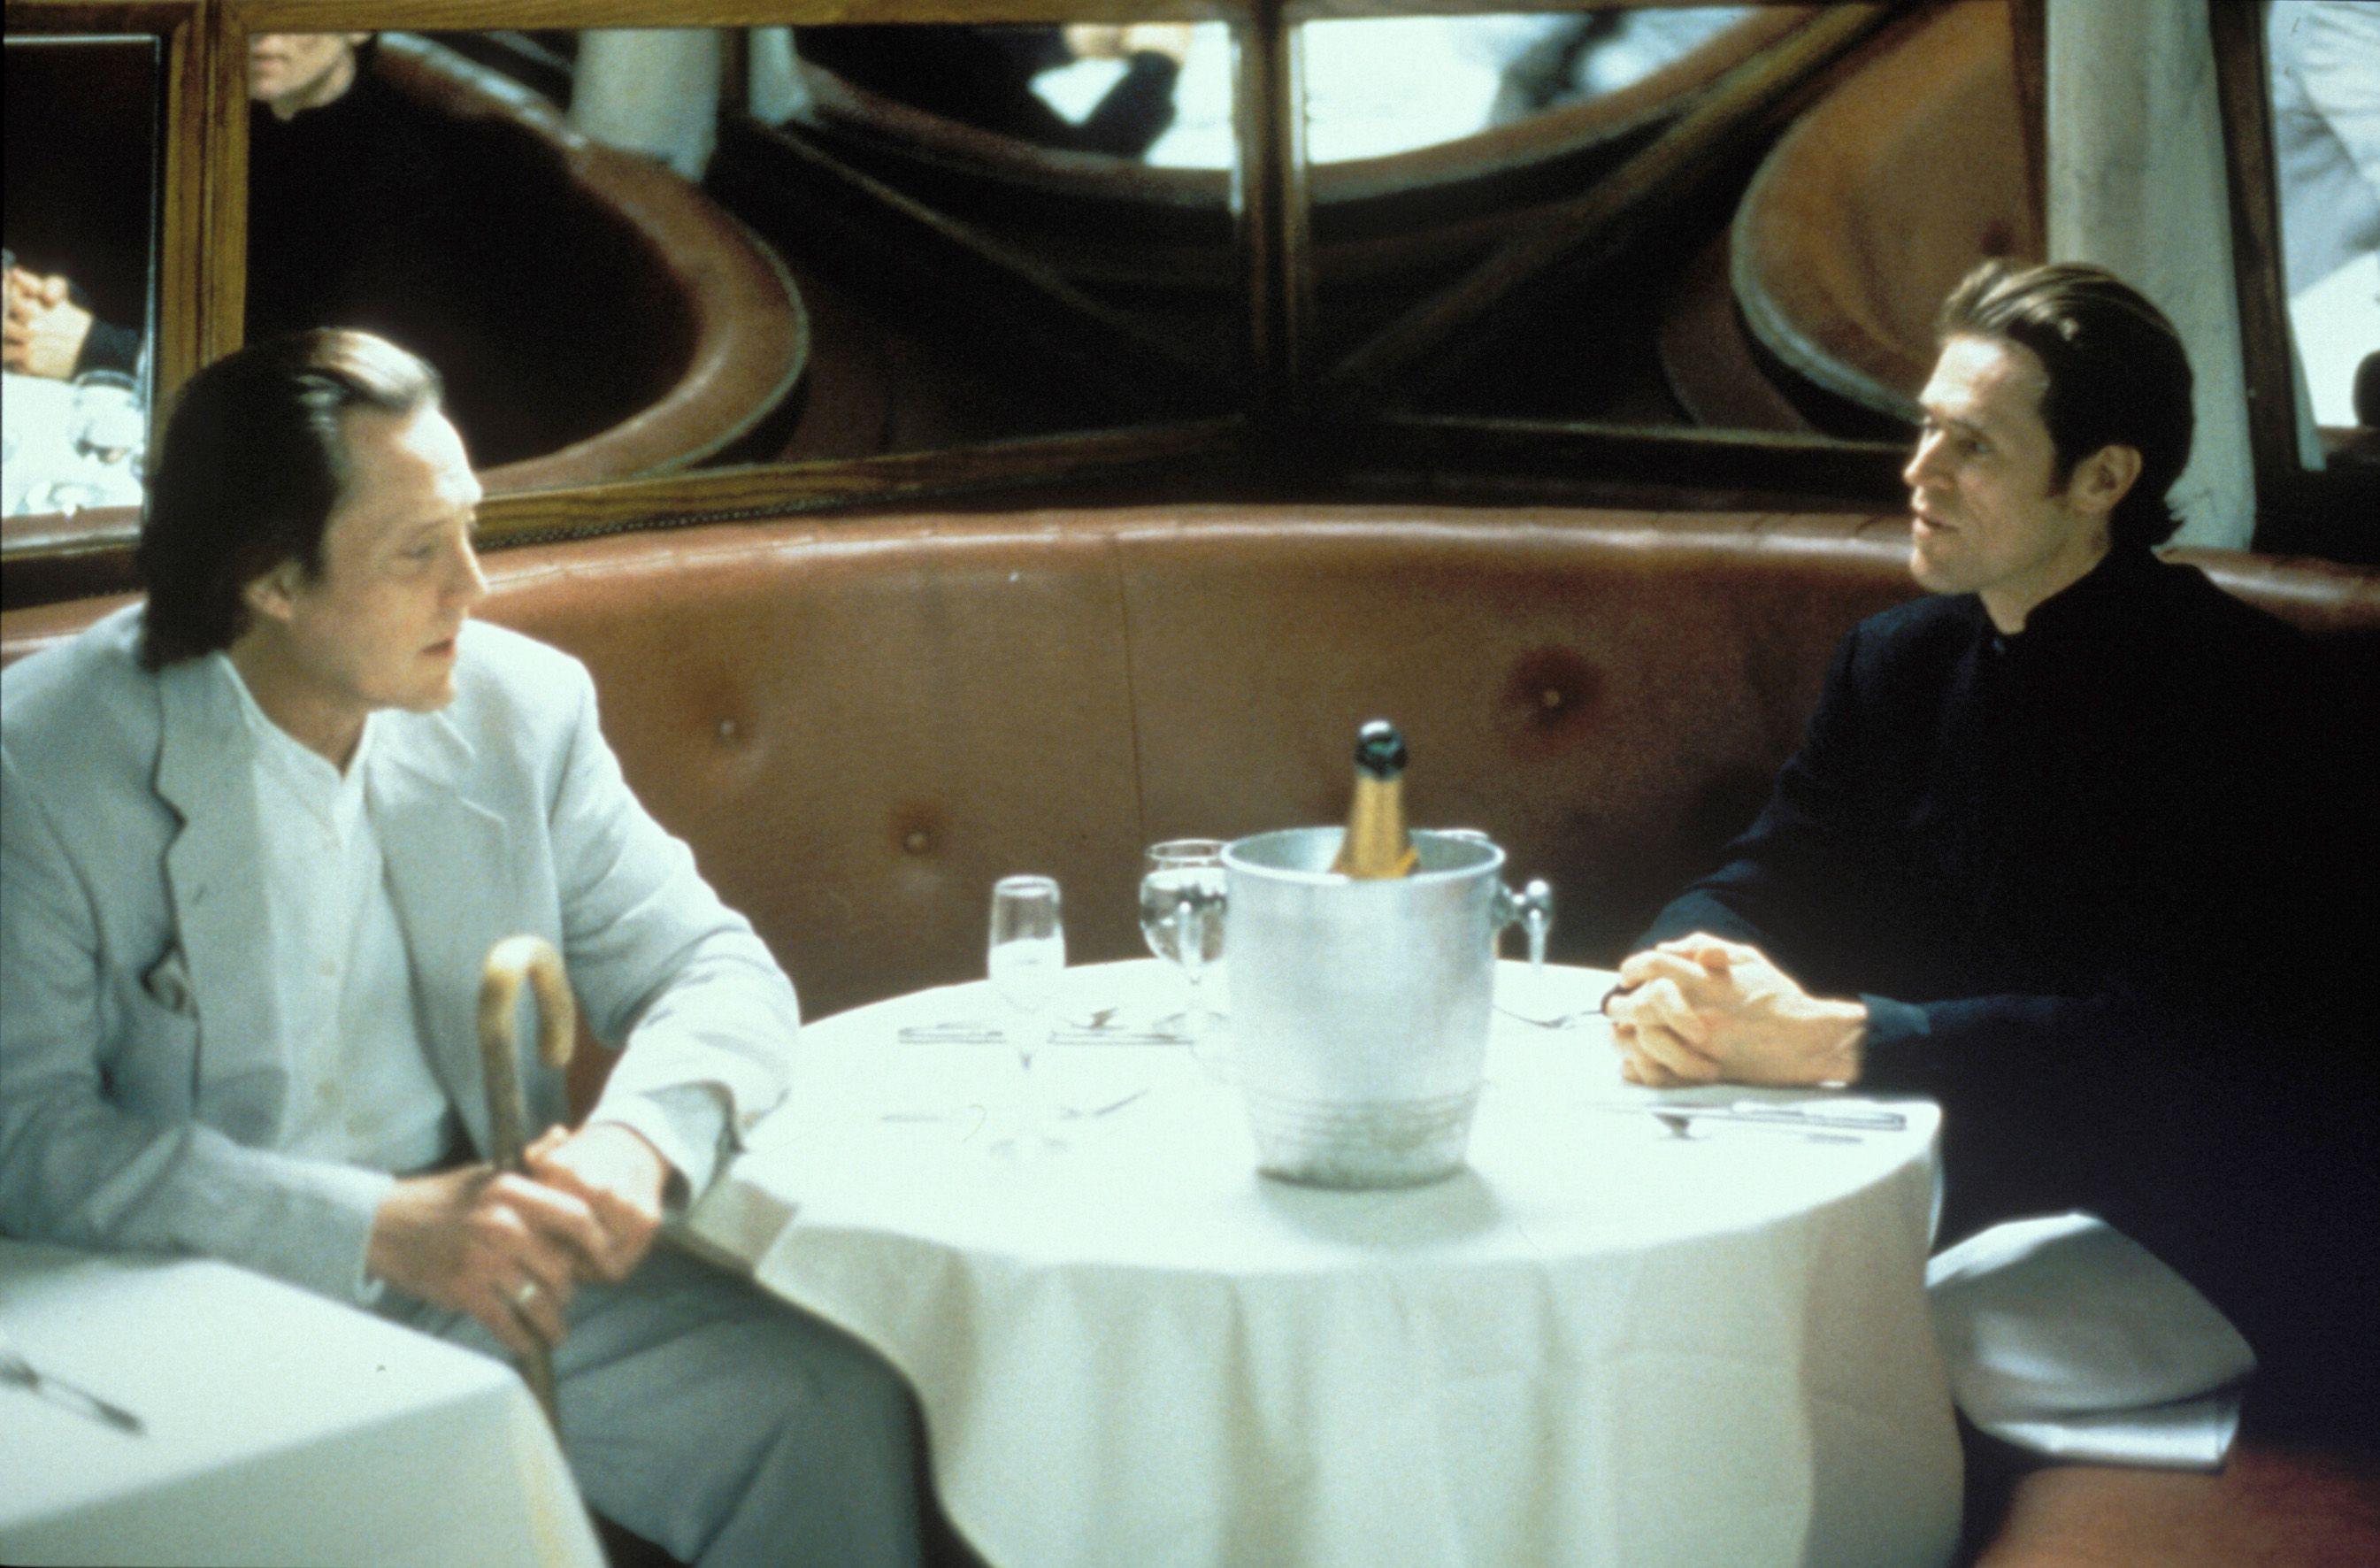 Christopher Walken and Willem DaFoe plot industrial espionage in New Rose Hotel (1998)